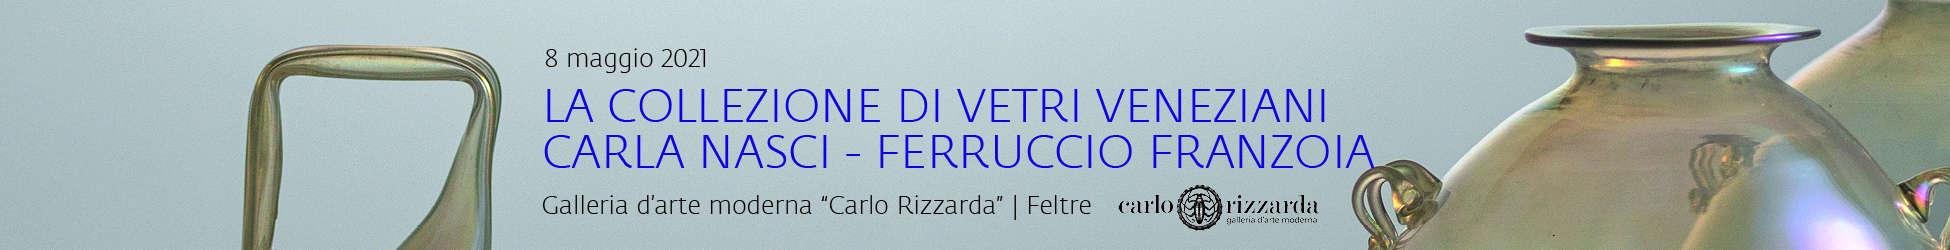 banner nasci-franzoia